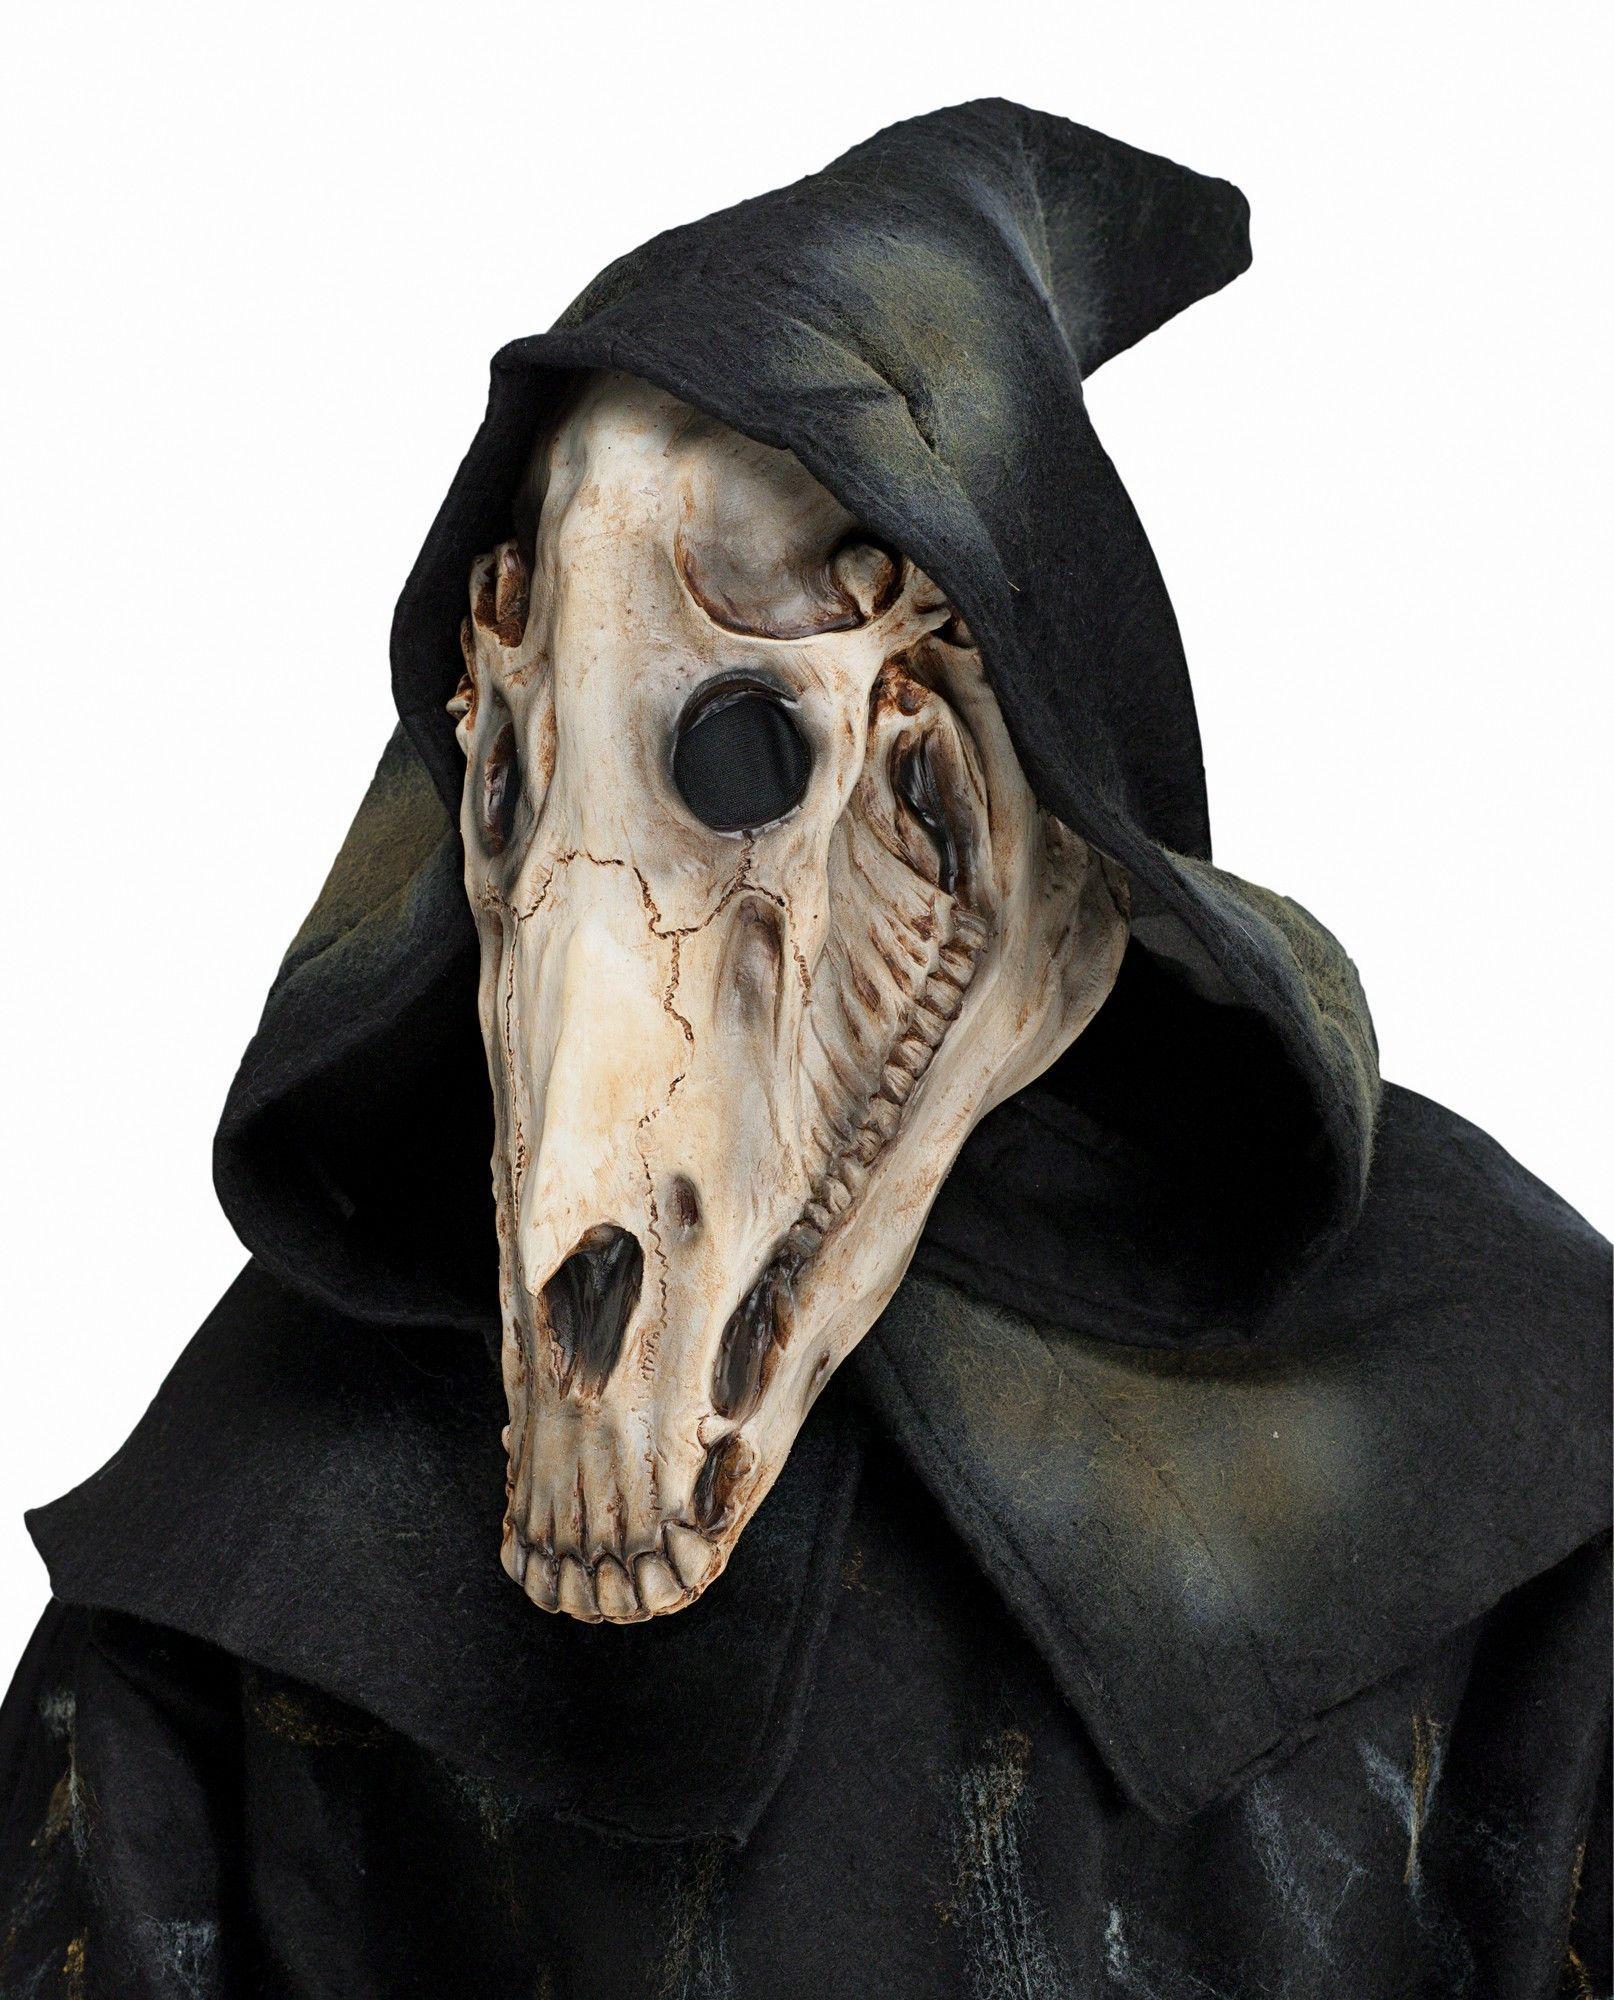 Lesson on making a mask: a predator